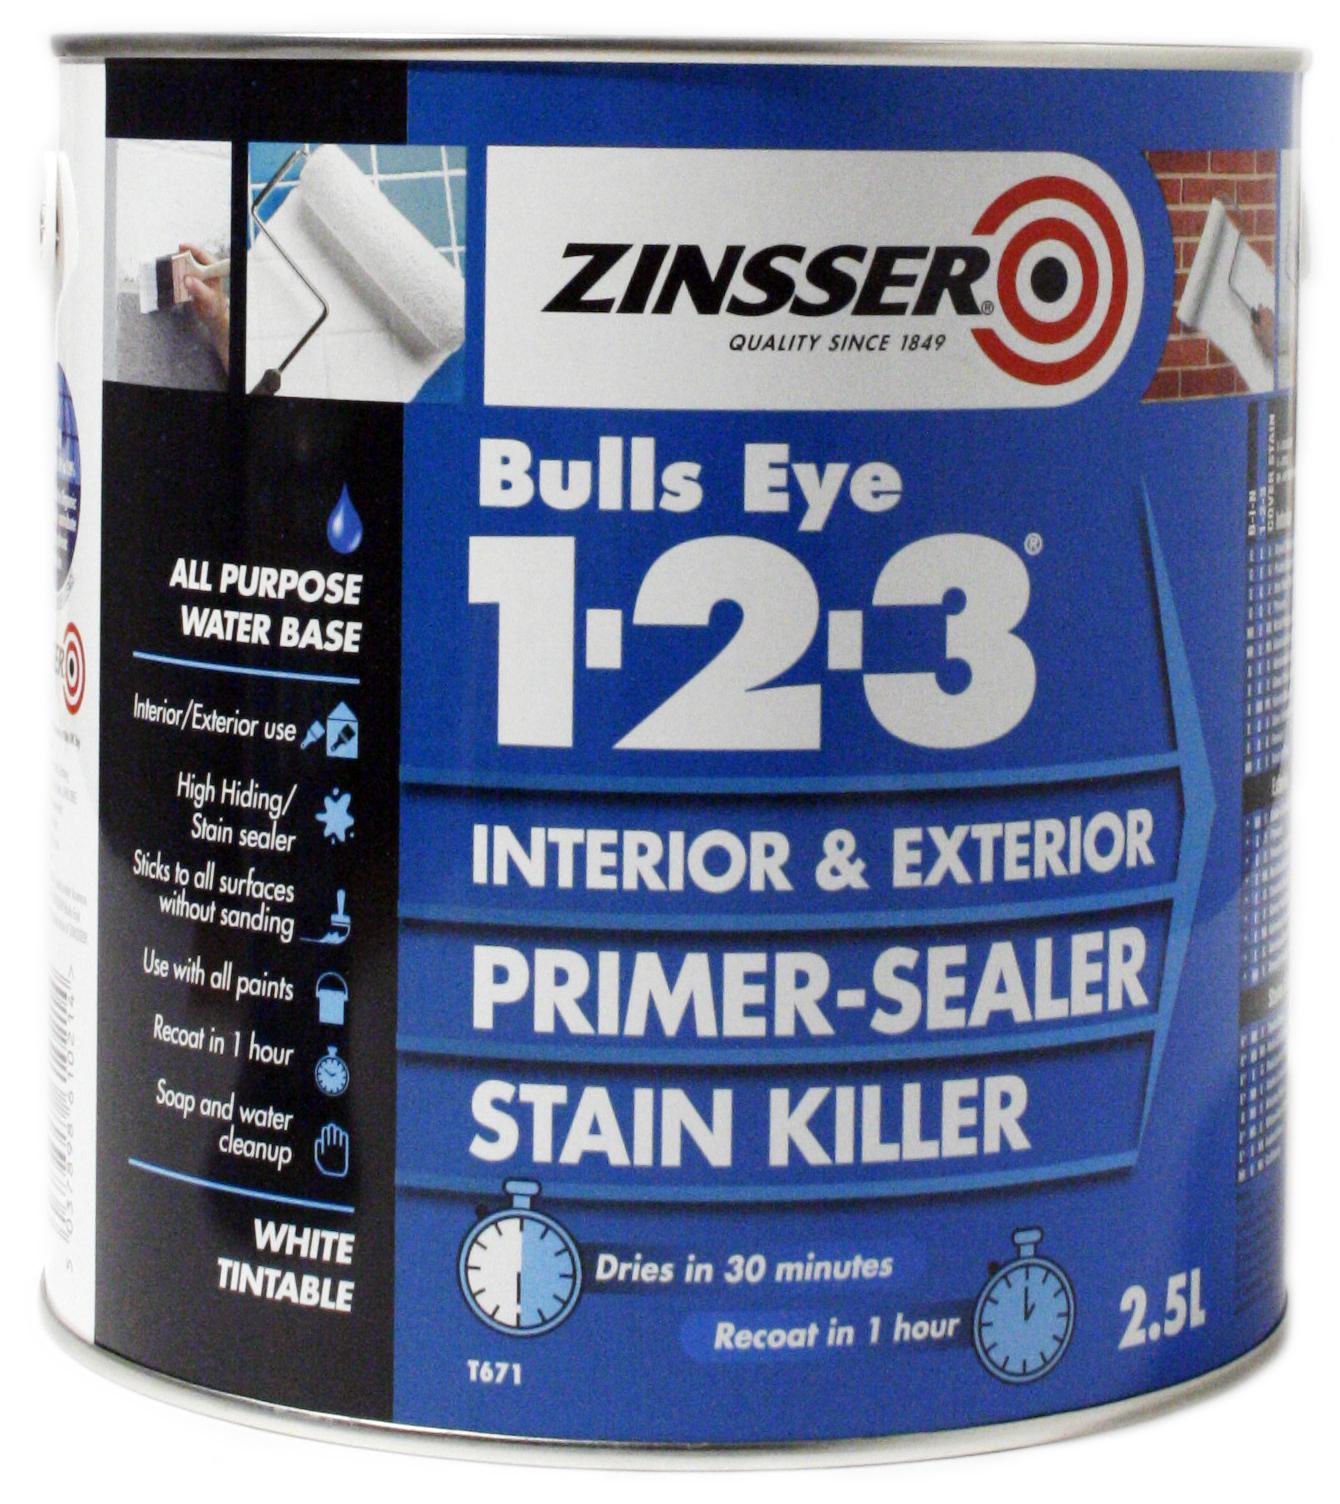 ZN610214 Zinsser Bulls Eye 2.5L